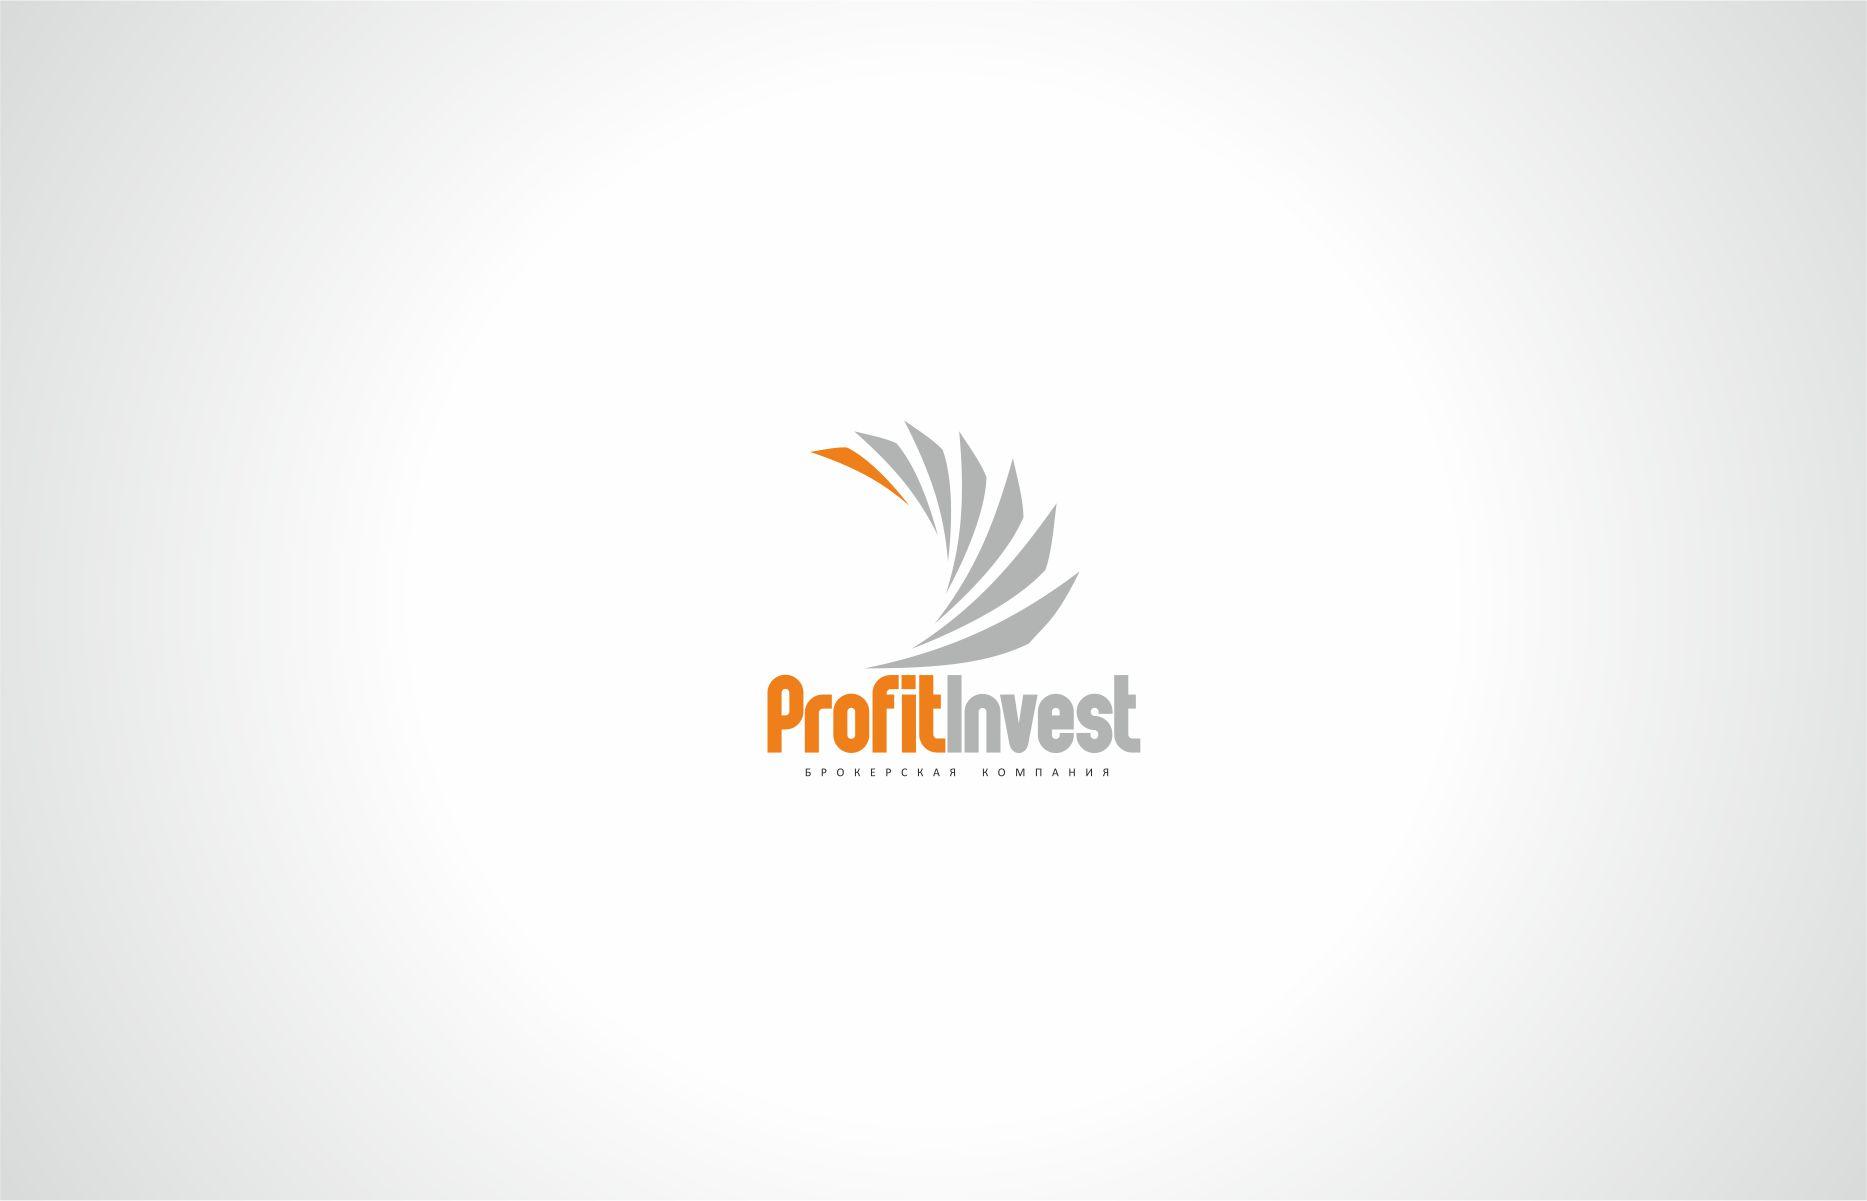 Разработка логотипа для брокерской компании фото f_4f1580a45d9ab.jpg